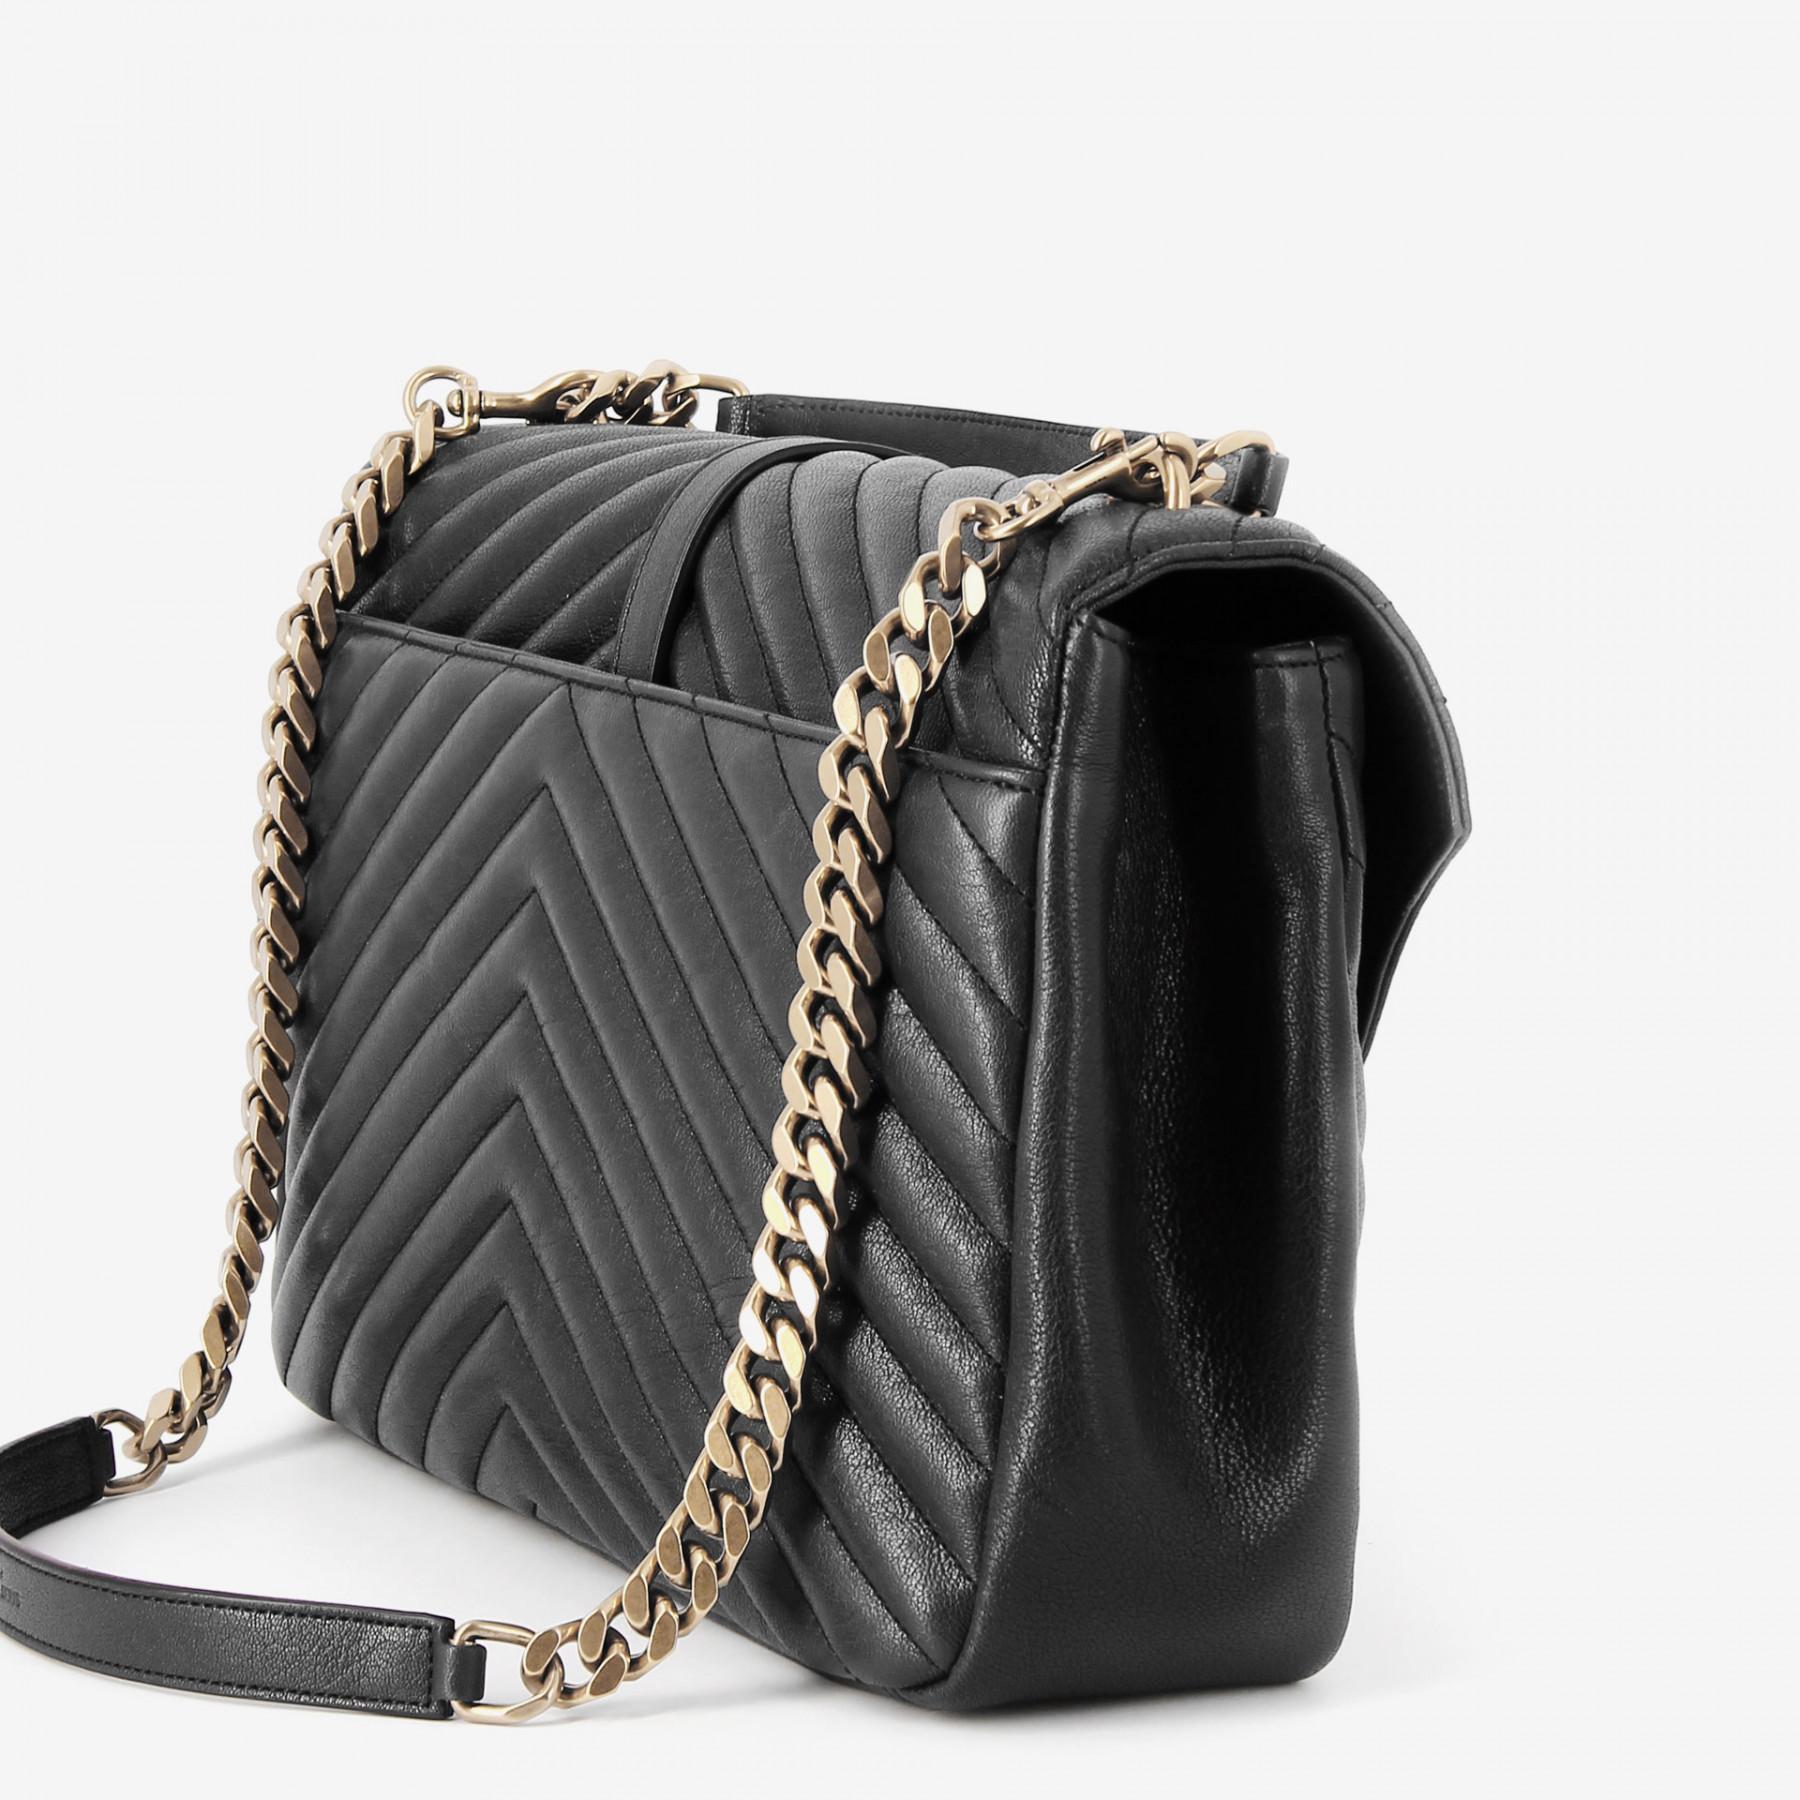 a6903cd5ca97 Lyst - Saint Laurent College Bag in Black